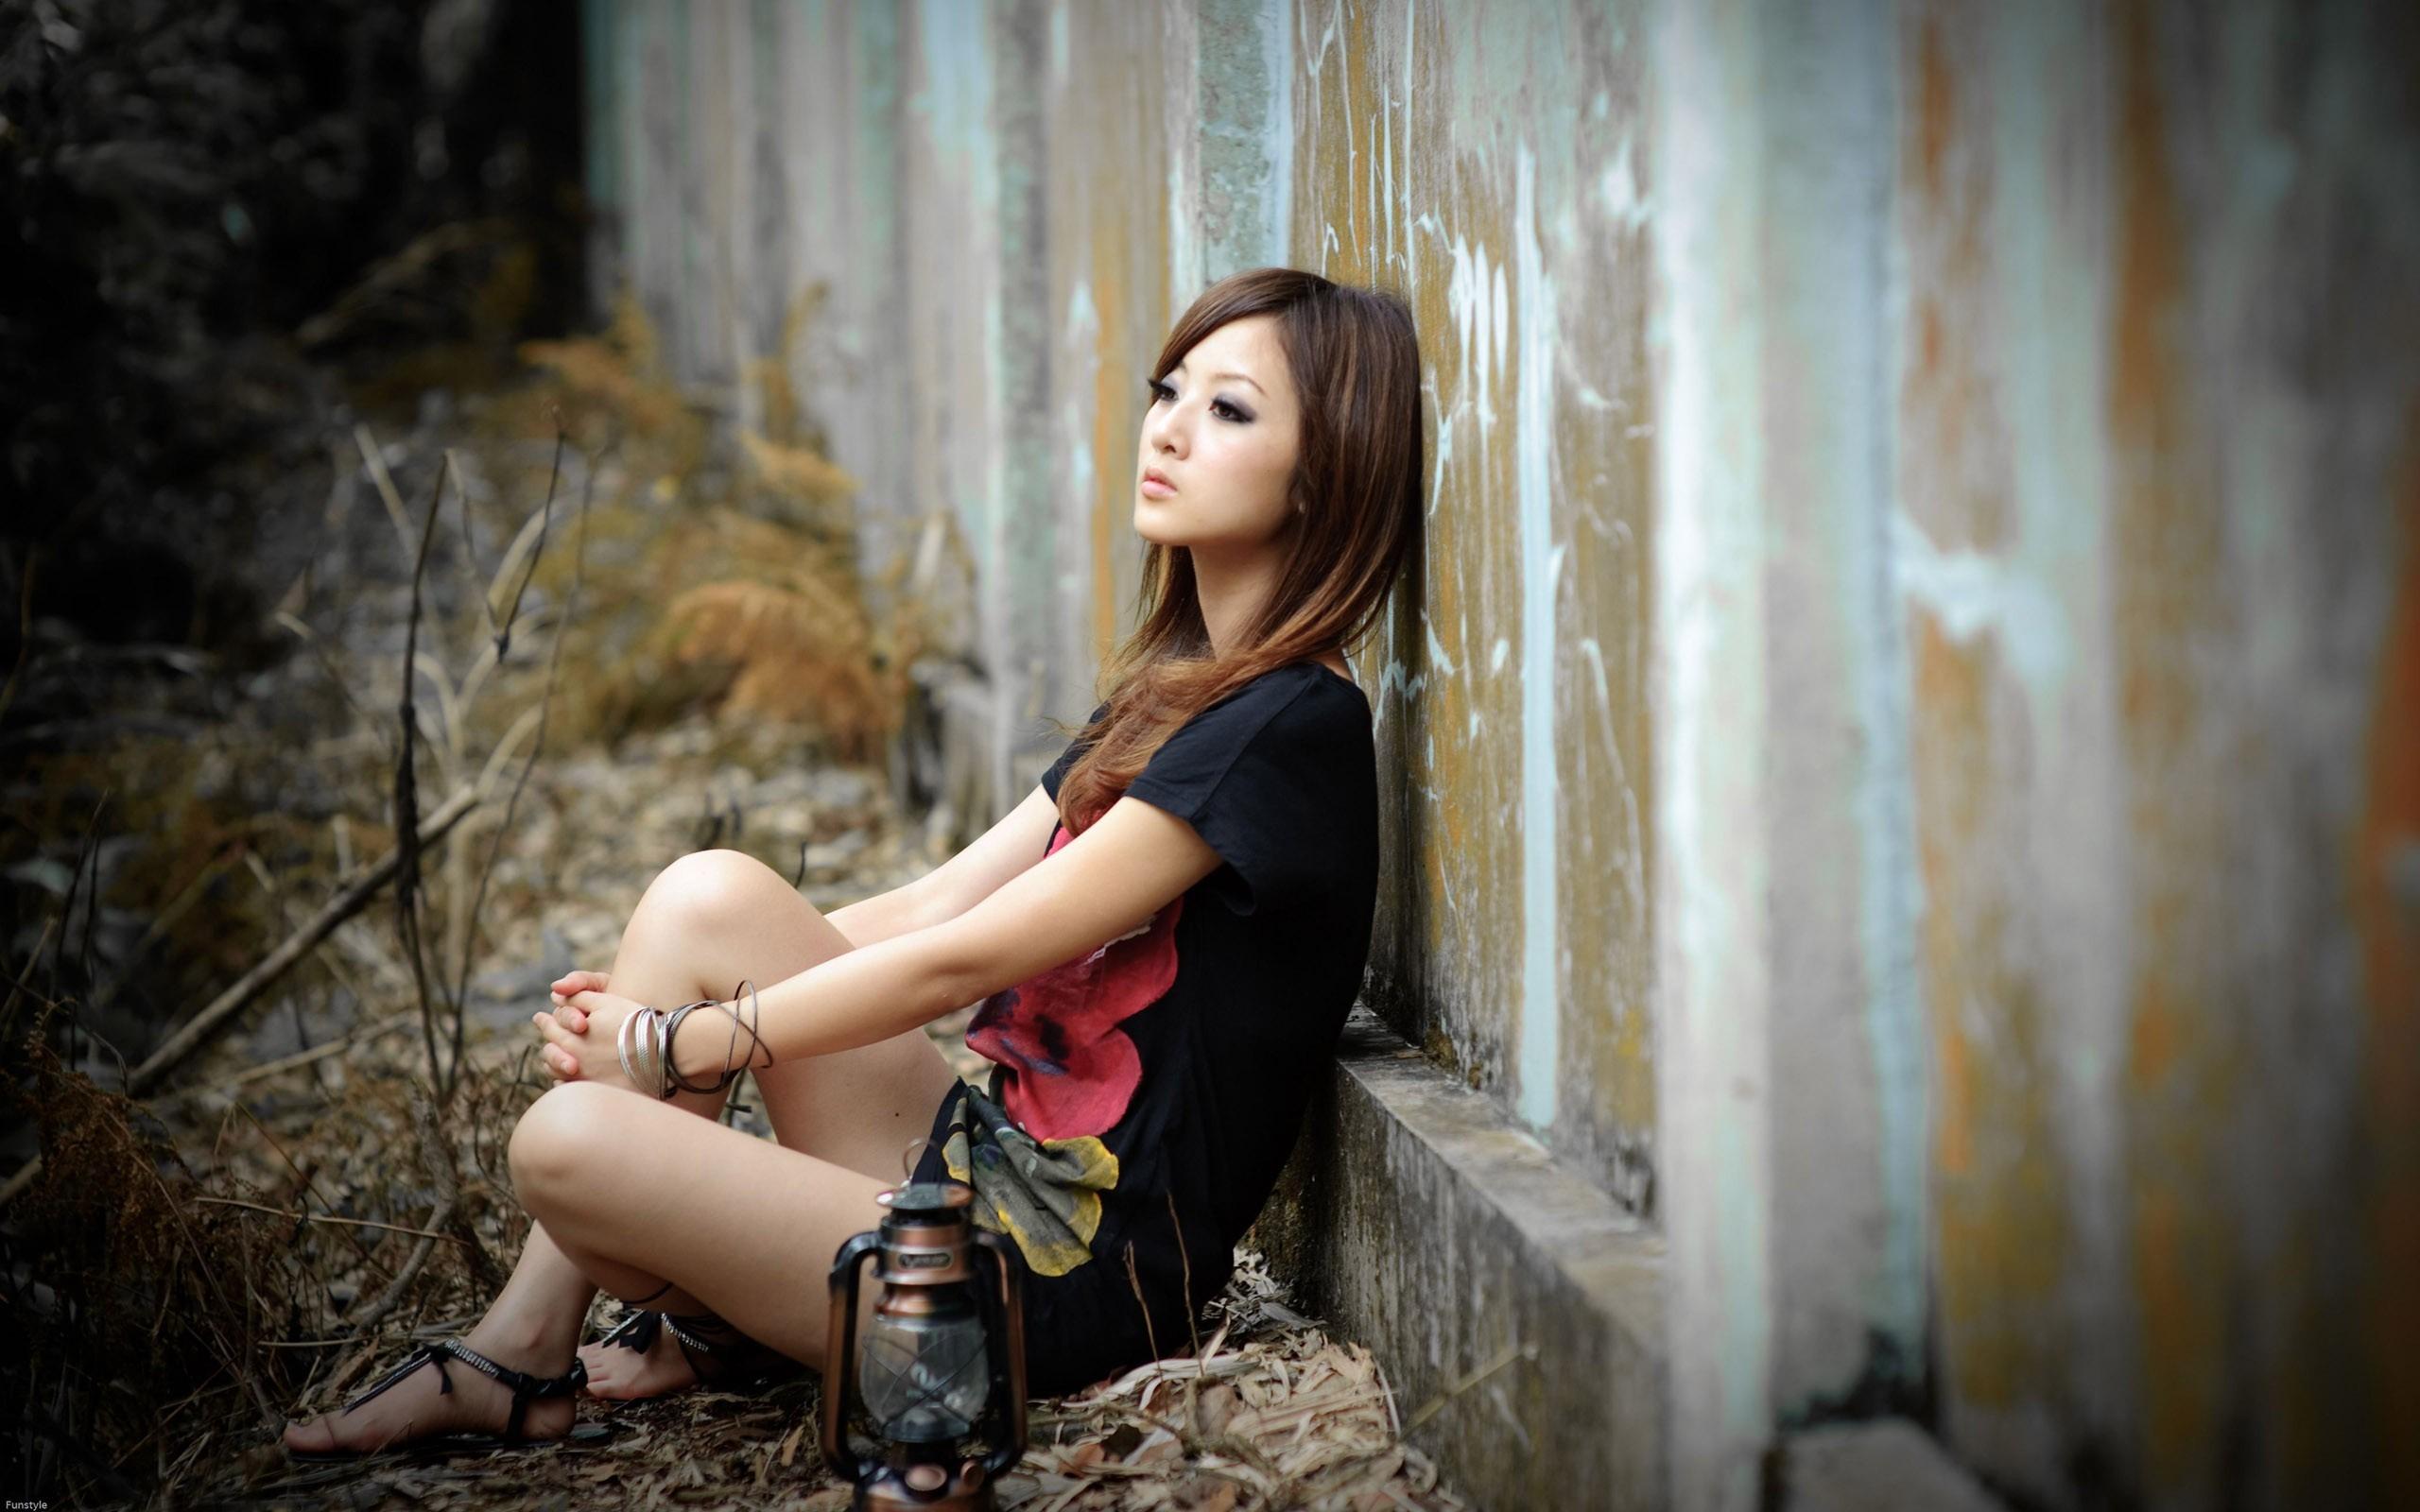 Mikako Zhang Kaijie HD Wallpaper Background Image 2560x1600 2560x1600